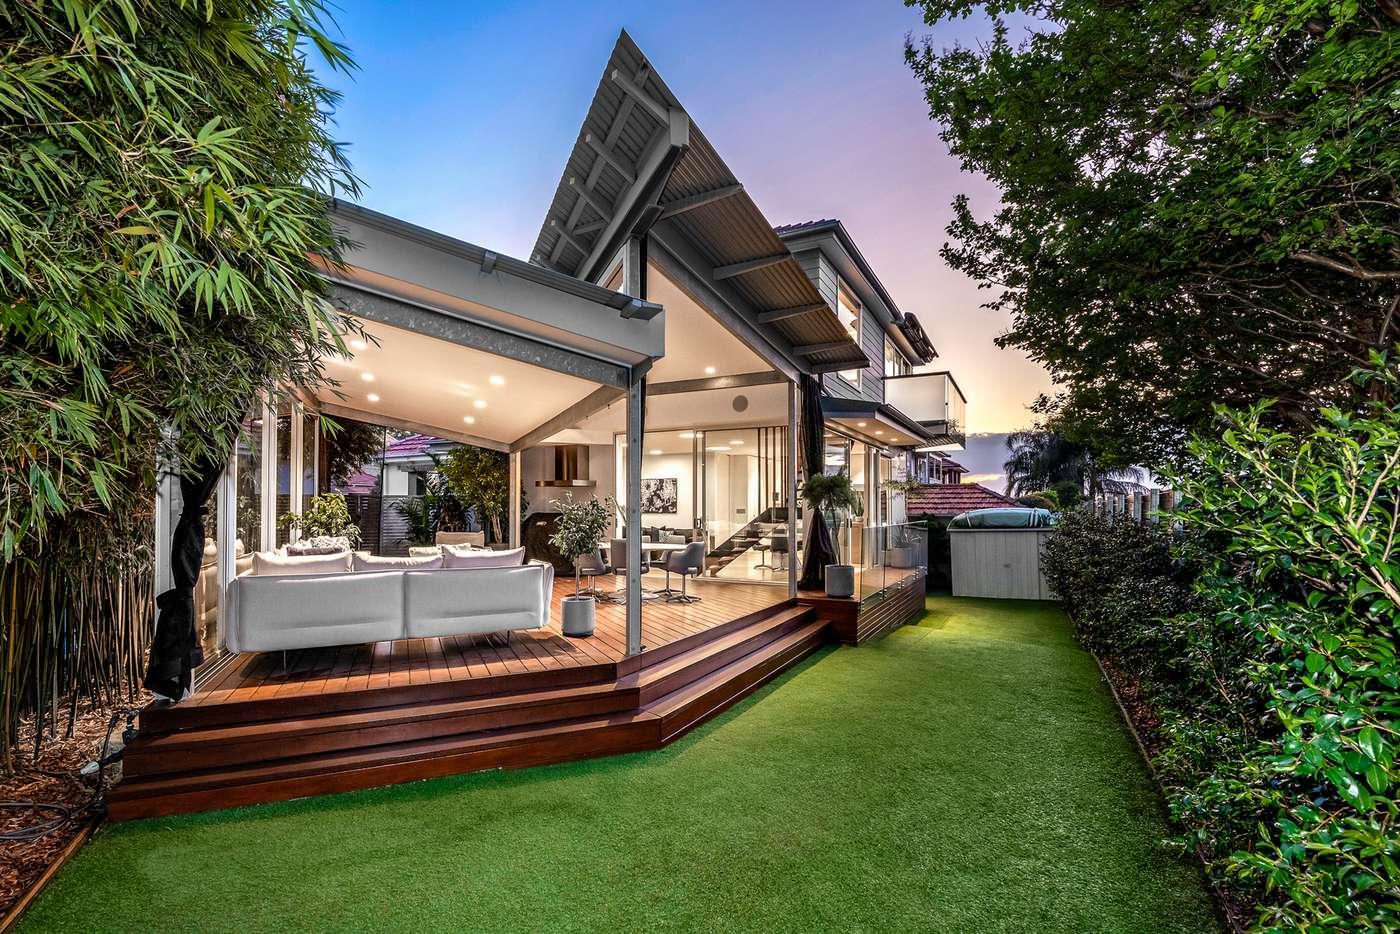 Main view of Homely house listing, 4 Gartfern Avenue, Wareemba NSW 2046